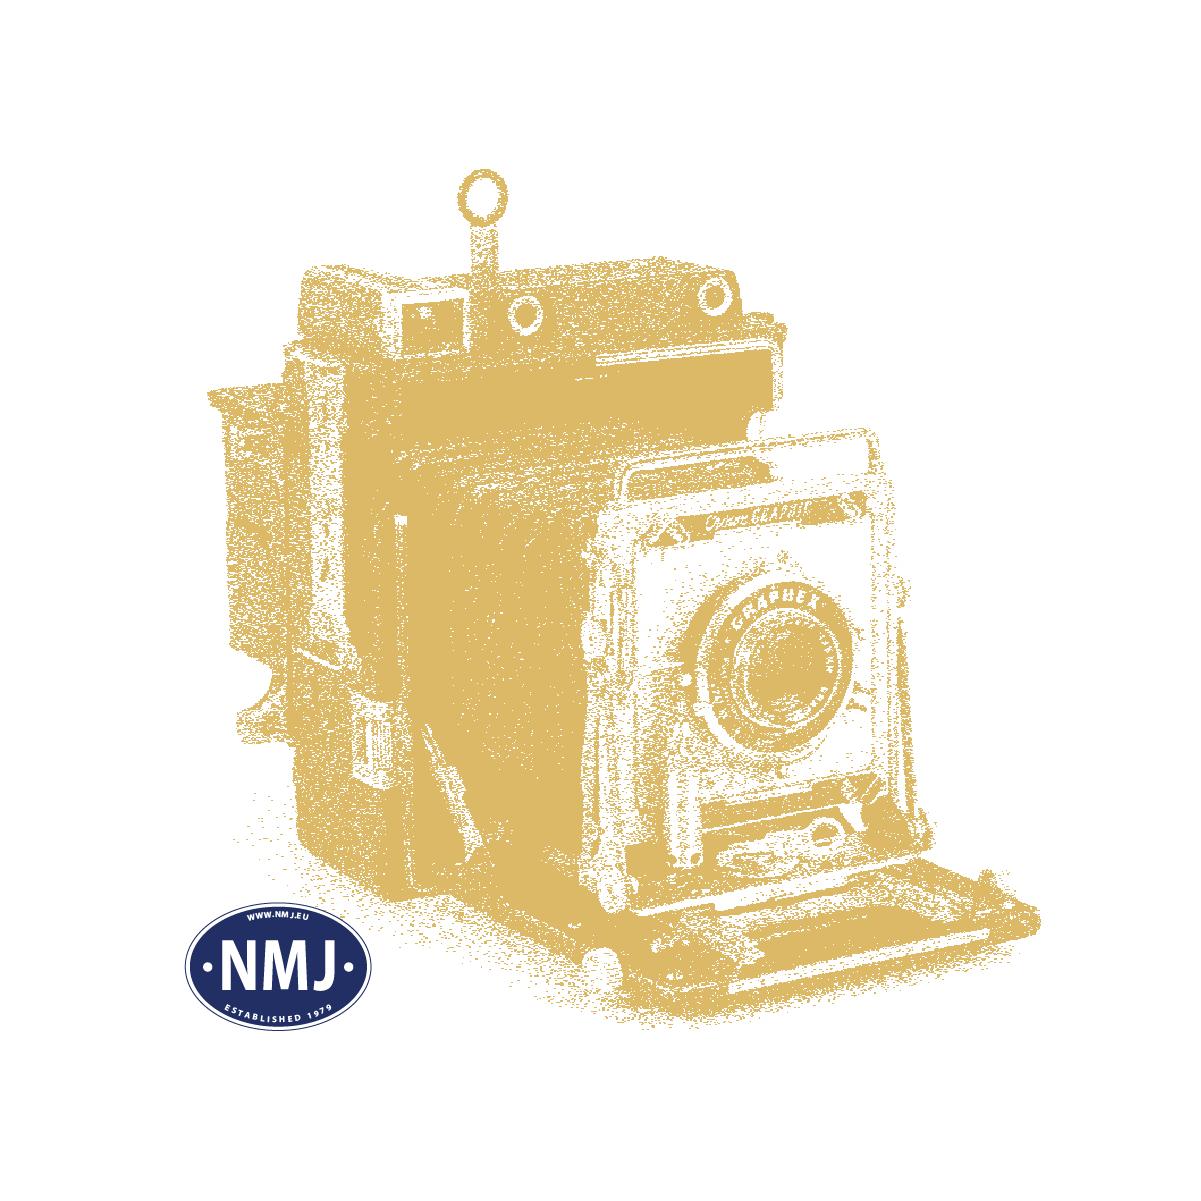 NMJT85.101AC - NMJ Topline NSB Di8.709, AC